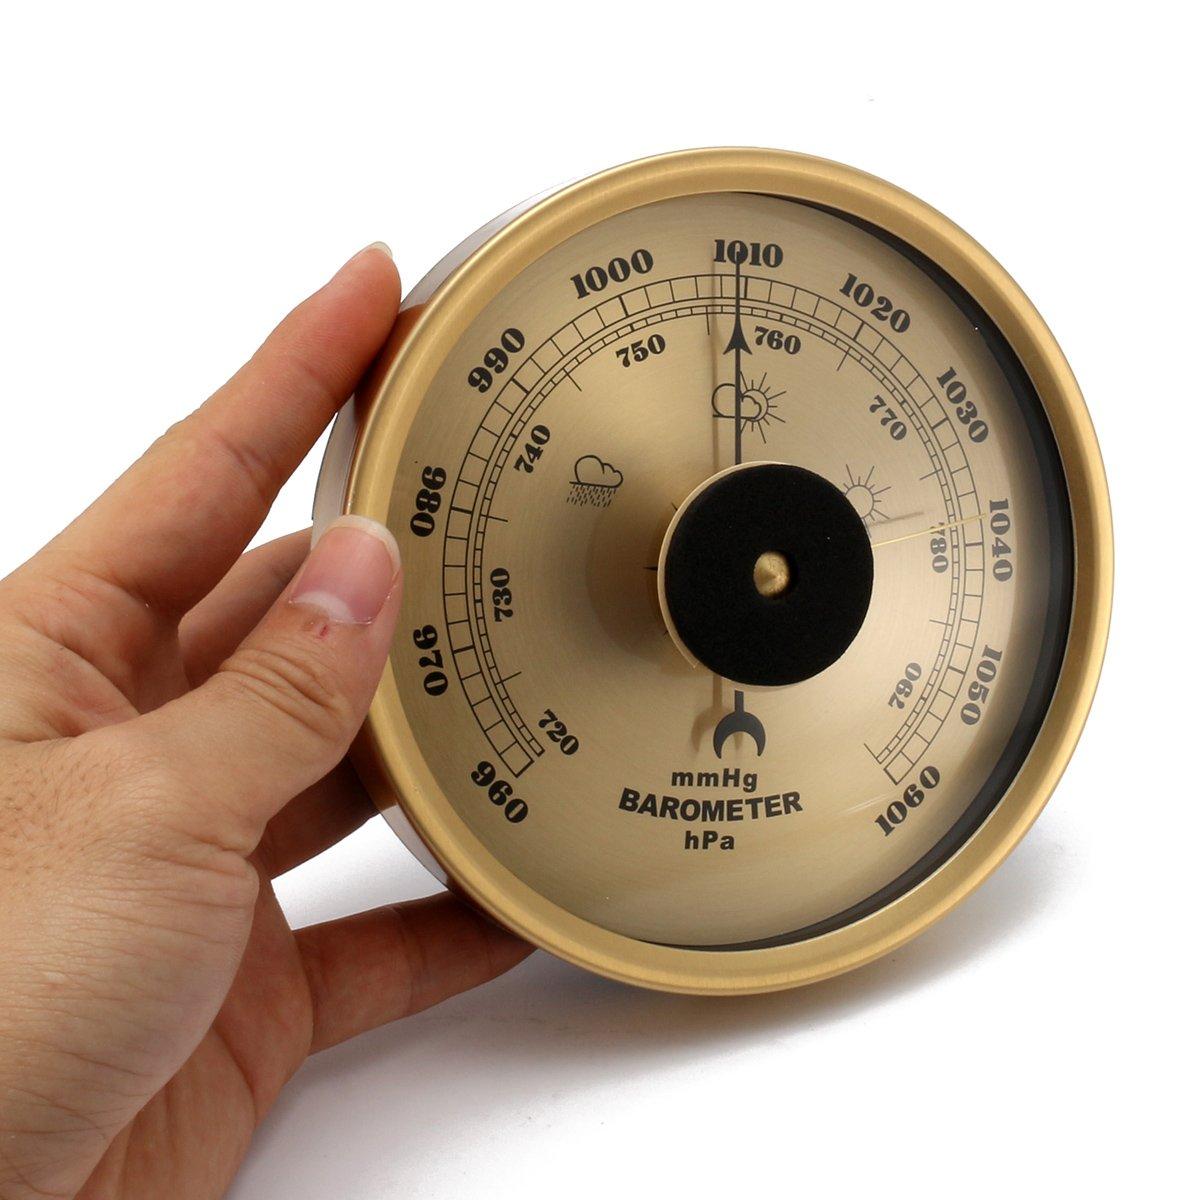 ~ Rampicante Esterno Barometro Meteo Pioggia Vetro Air Pressure Gauge 960 1060 Hpa Generic